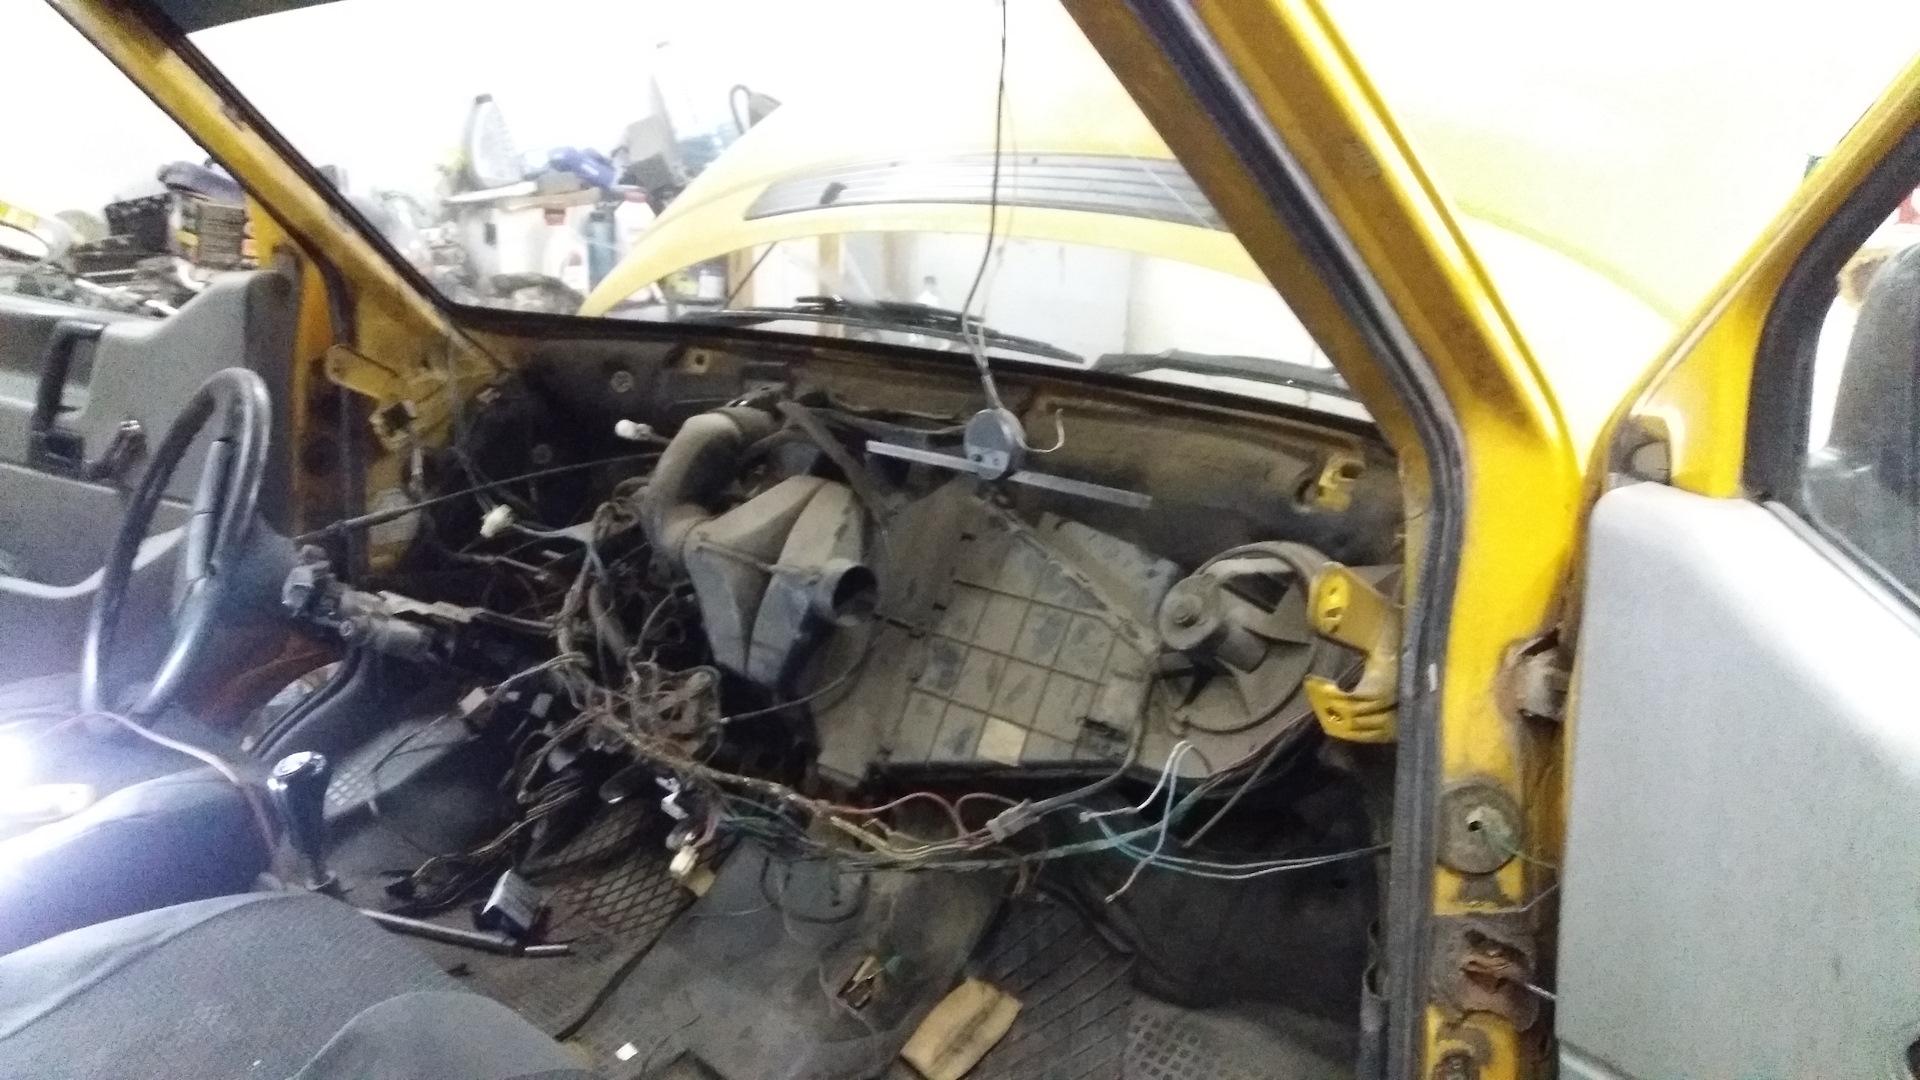 Замена радиатора печки фольксваген транспортер спк конвейер